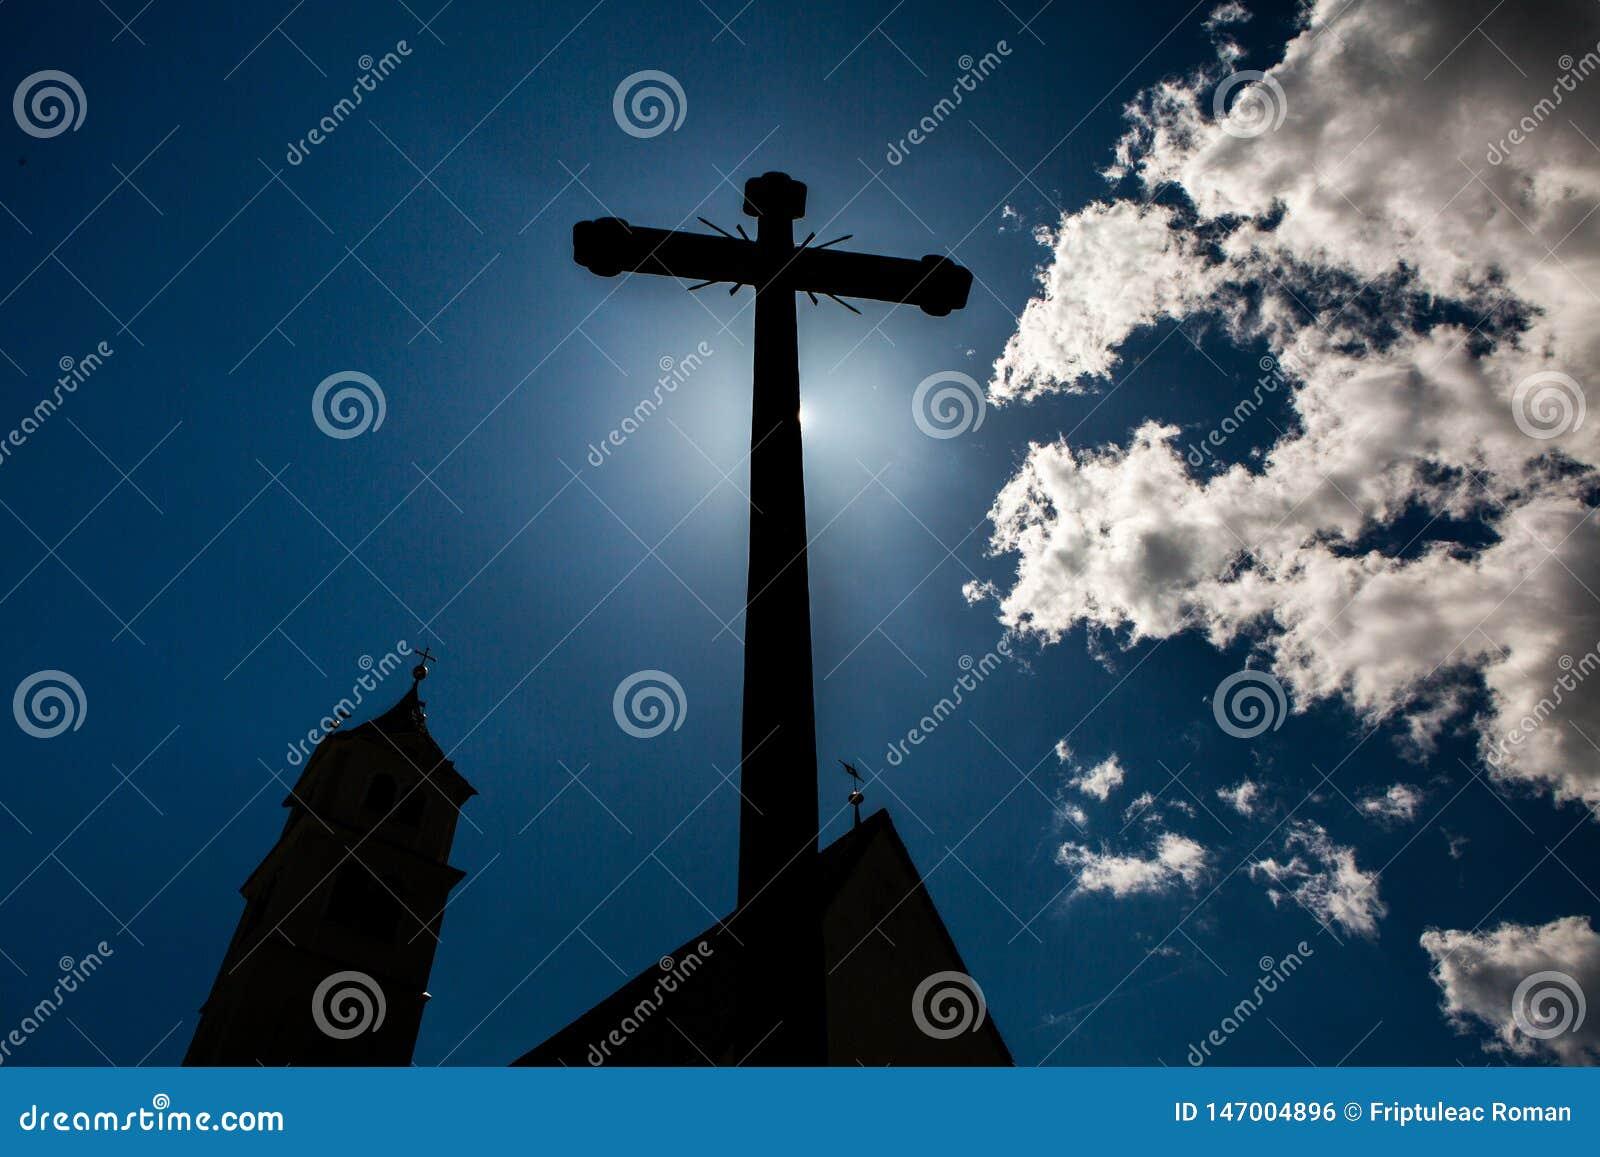 Concept cross religion symbol silhouette over sky. Christian religion background concept. The cross symbol for Jesus Christ.